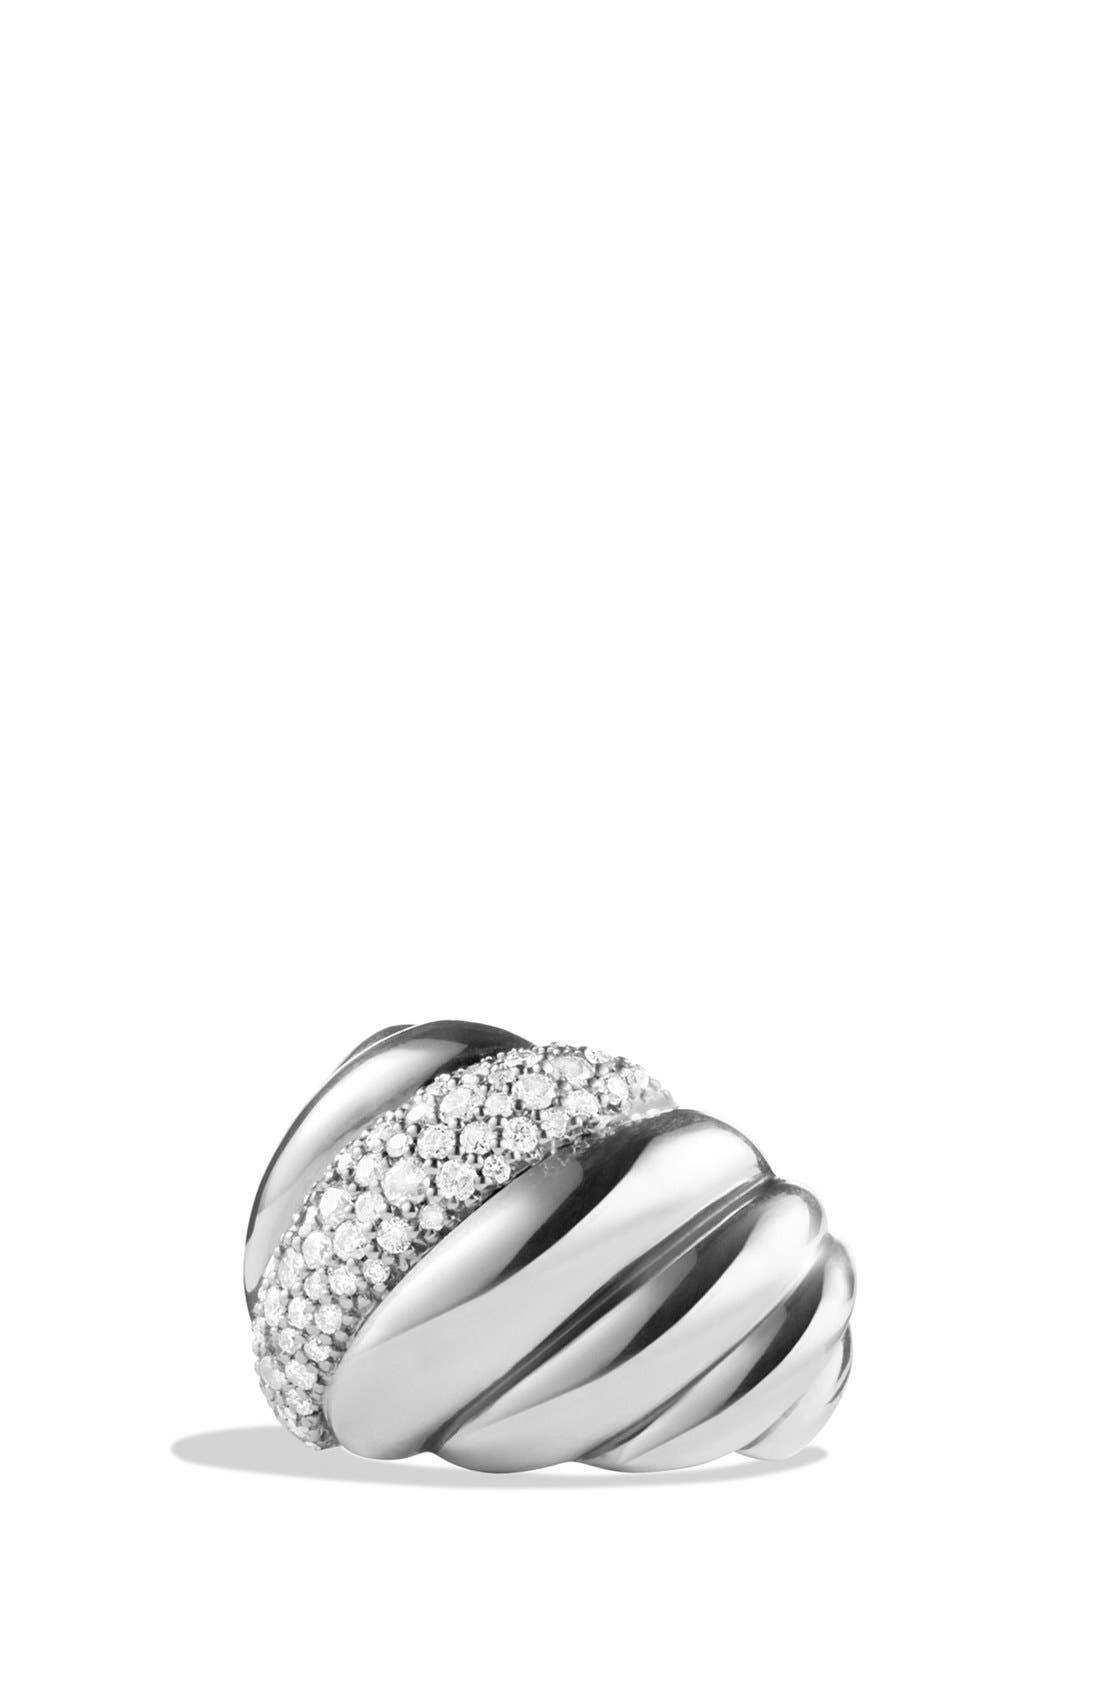 Alternate Image 1 Selected - David Yurman 'Hampton Cable' Ring with Diamonds